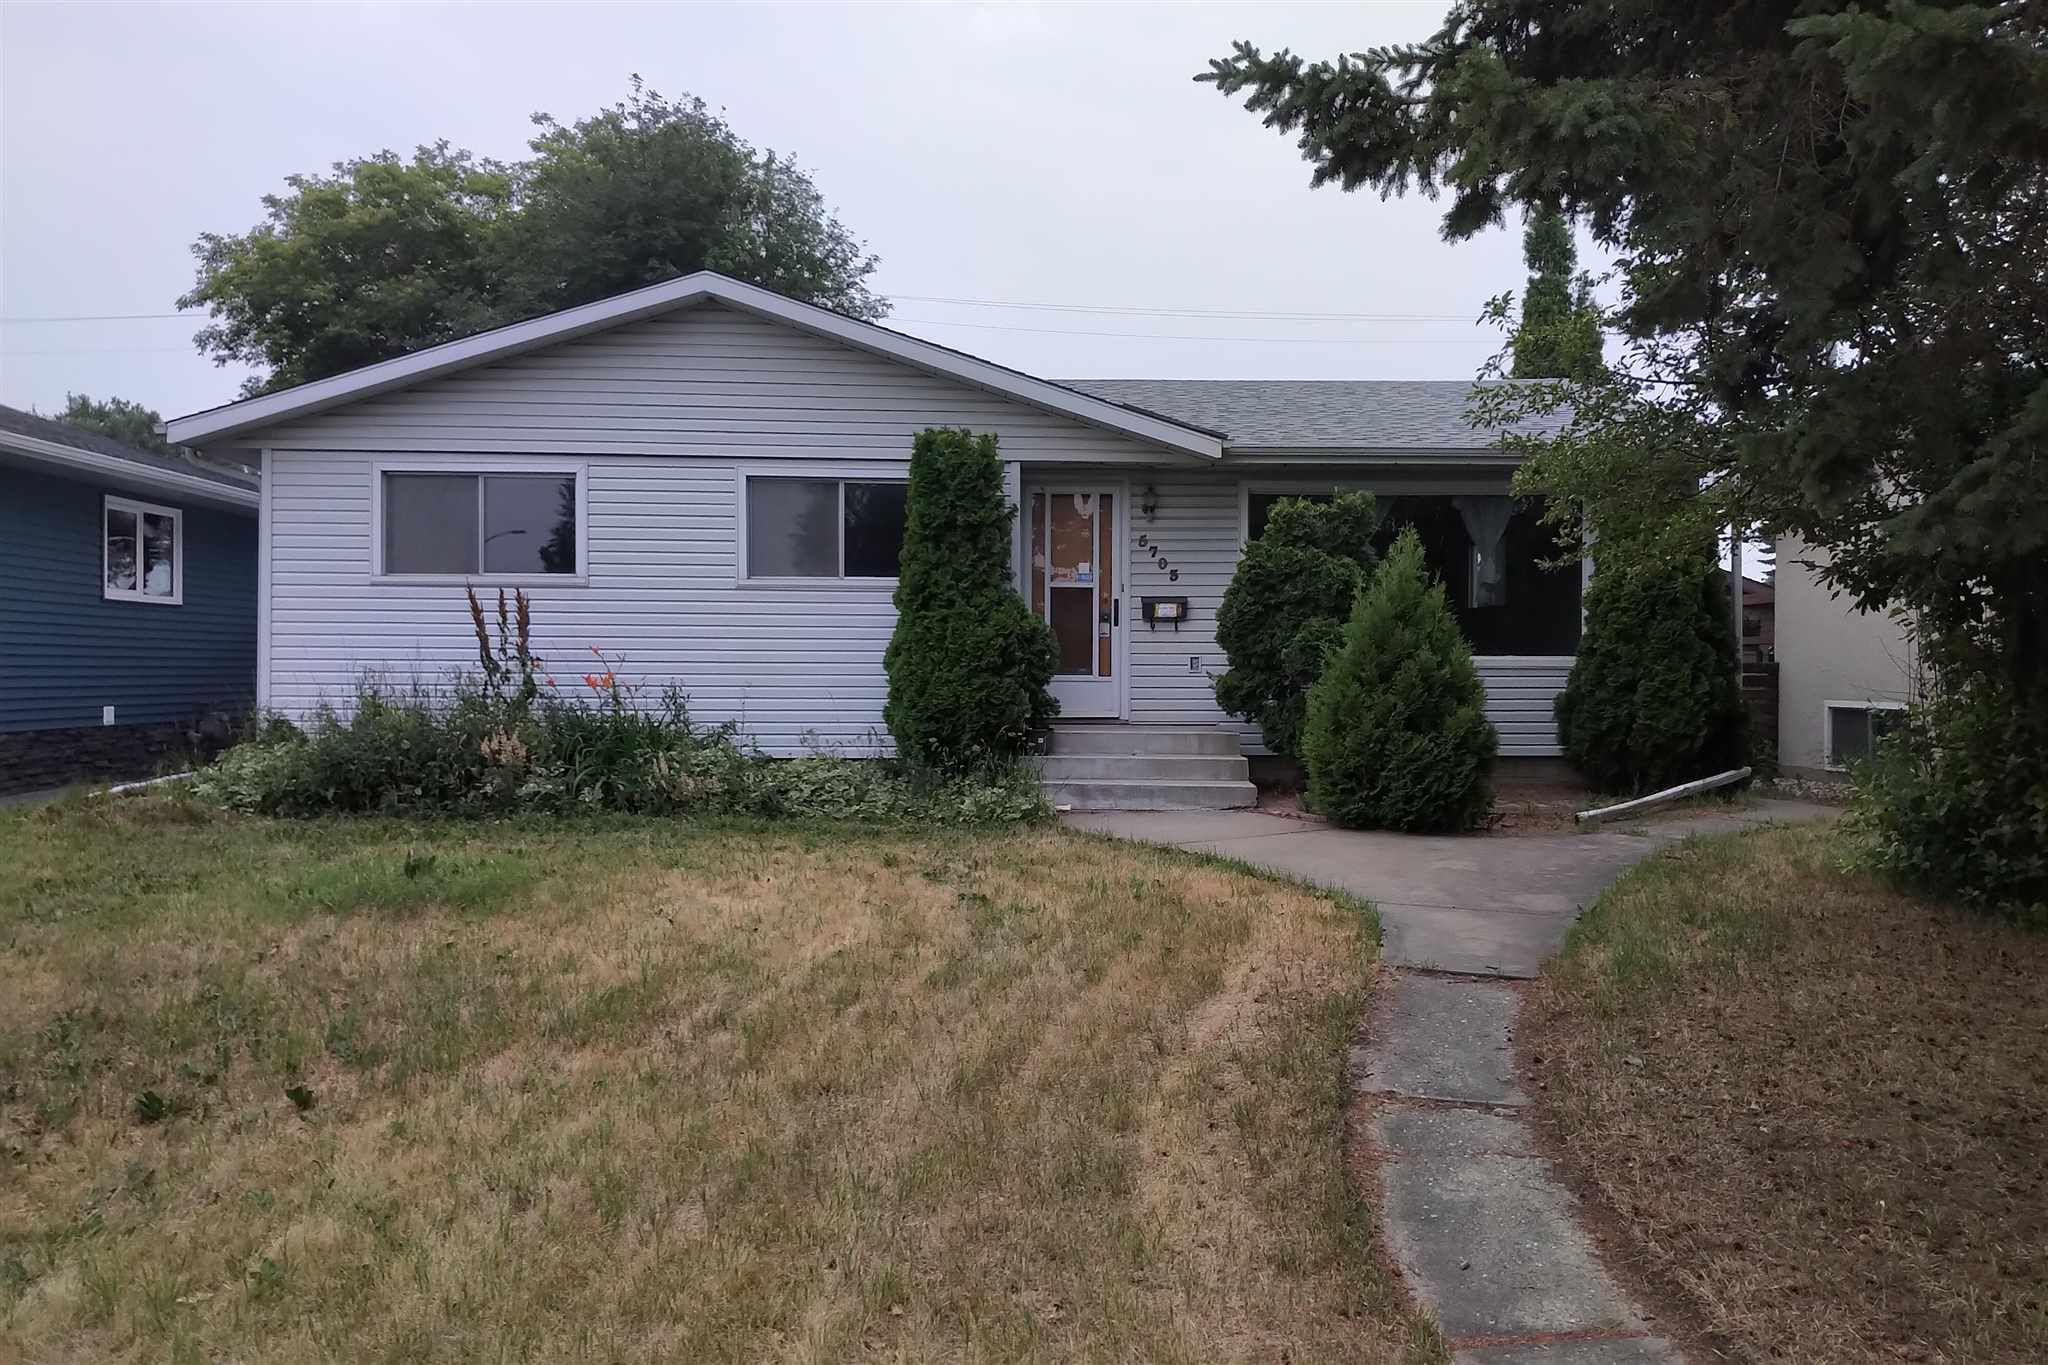 Main Photo: 5703 89 Avenue in Edmonton: Zone 18 House for sale : MLS®# E4255214